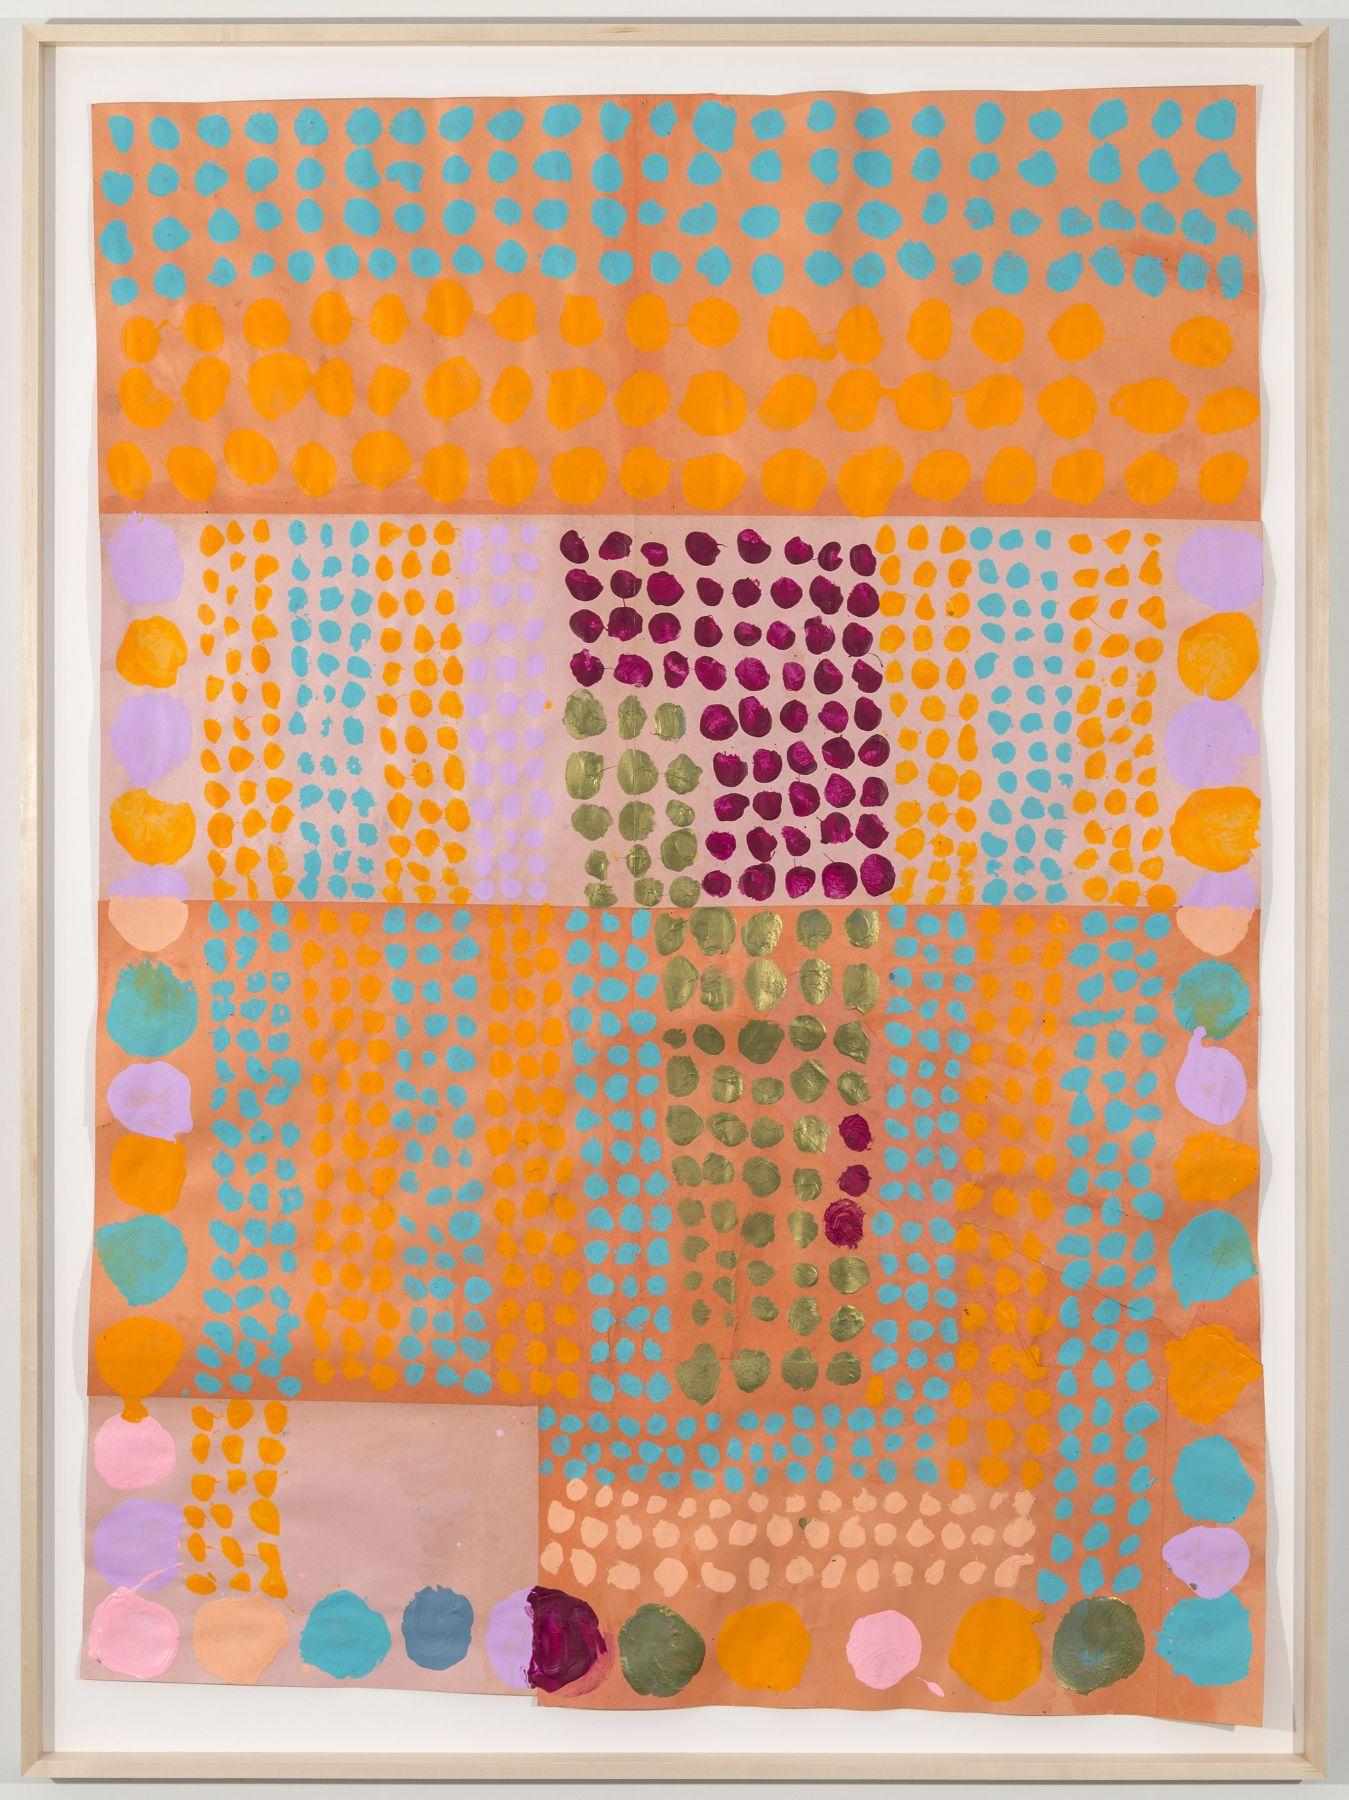 BRIAN BELOTT, Applaud Pinwheels,2015